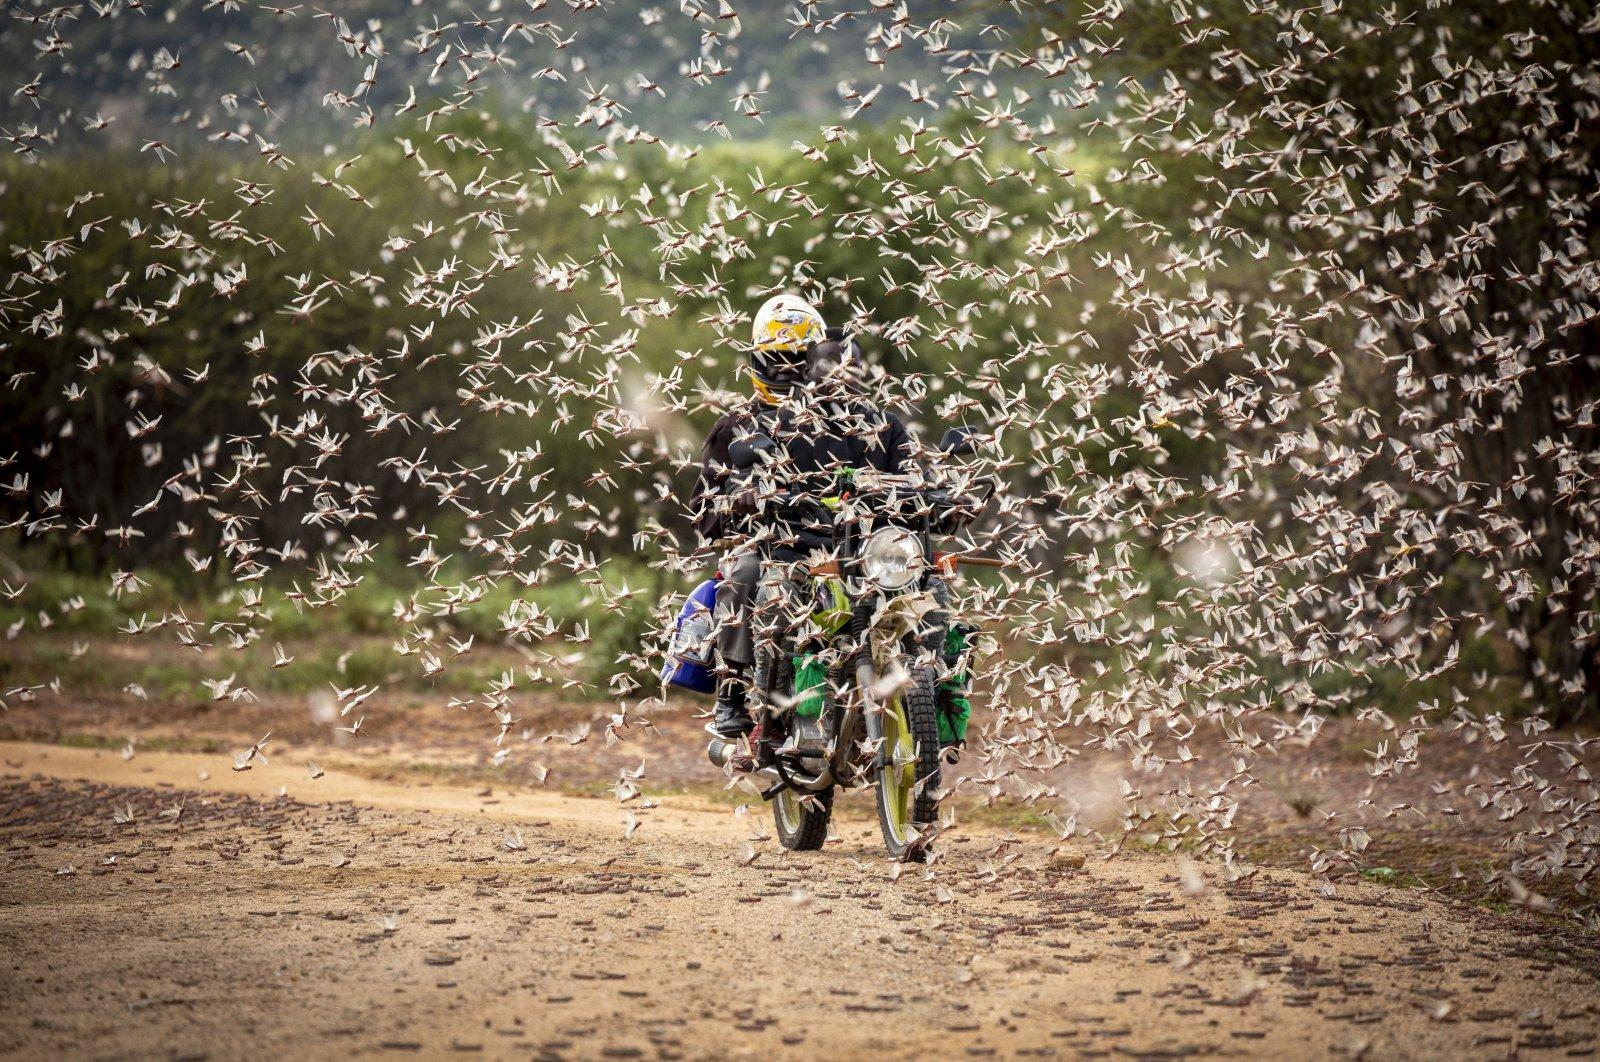 A motorcyclist rides through a swarm of desert locusts, Kipsing, Kenya, March 31, 2020. (AFP Photo)